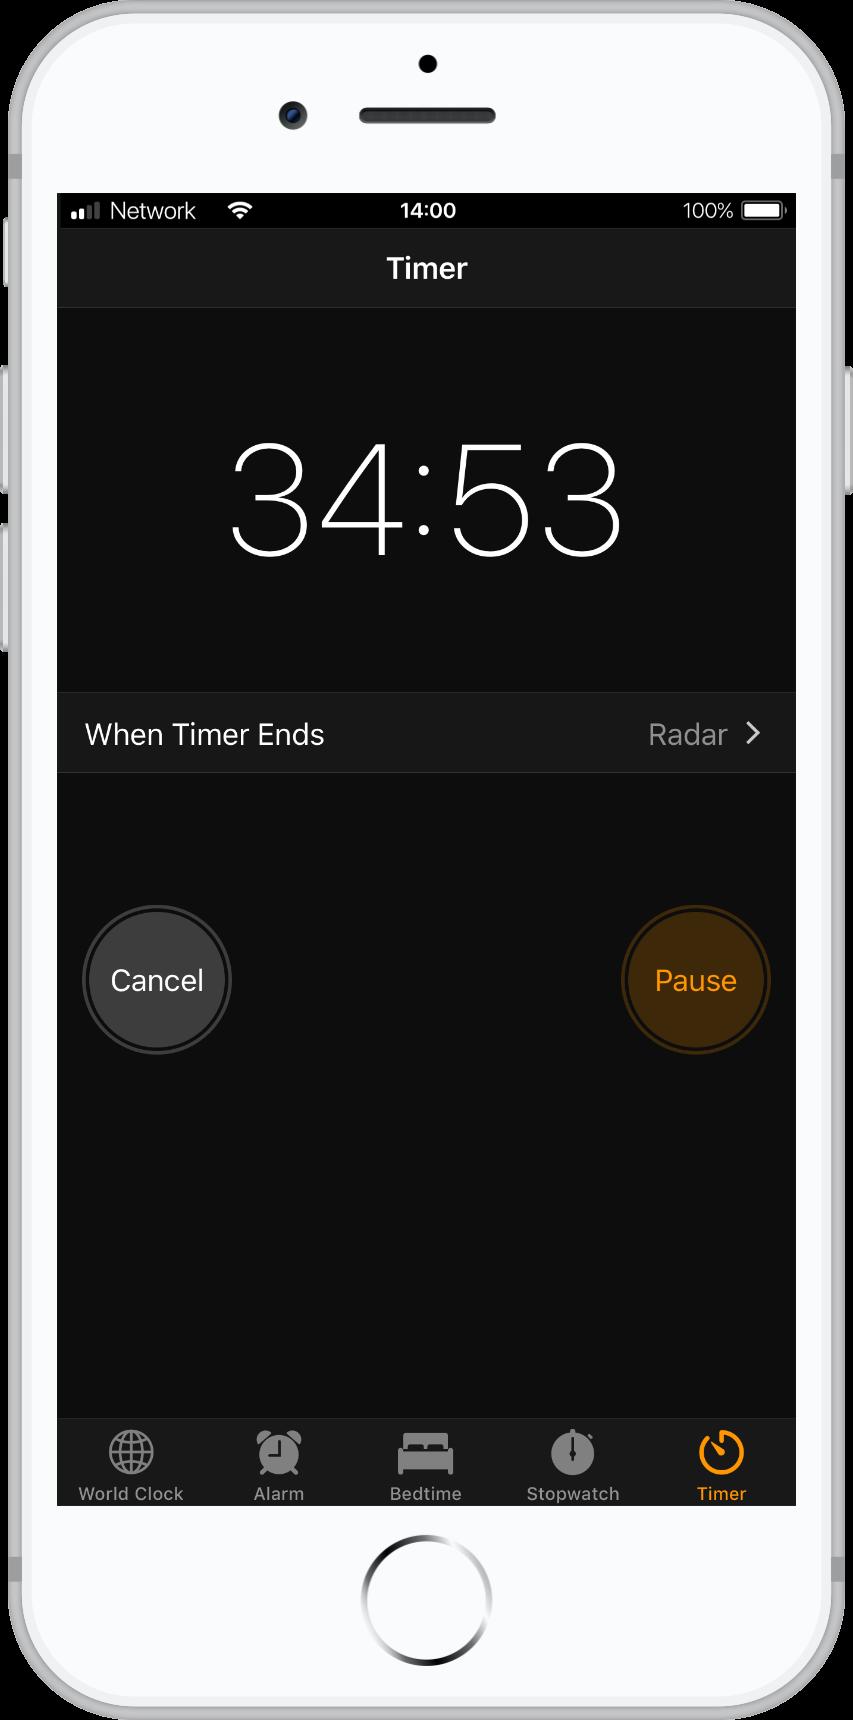 Set a timer for 15 minutes